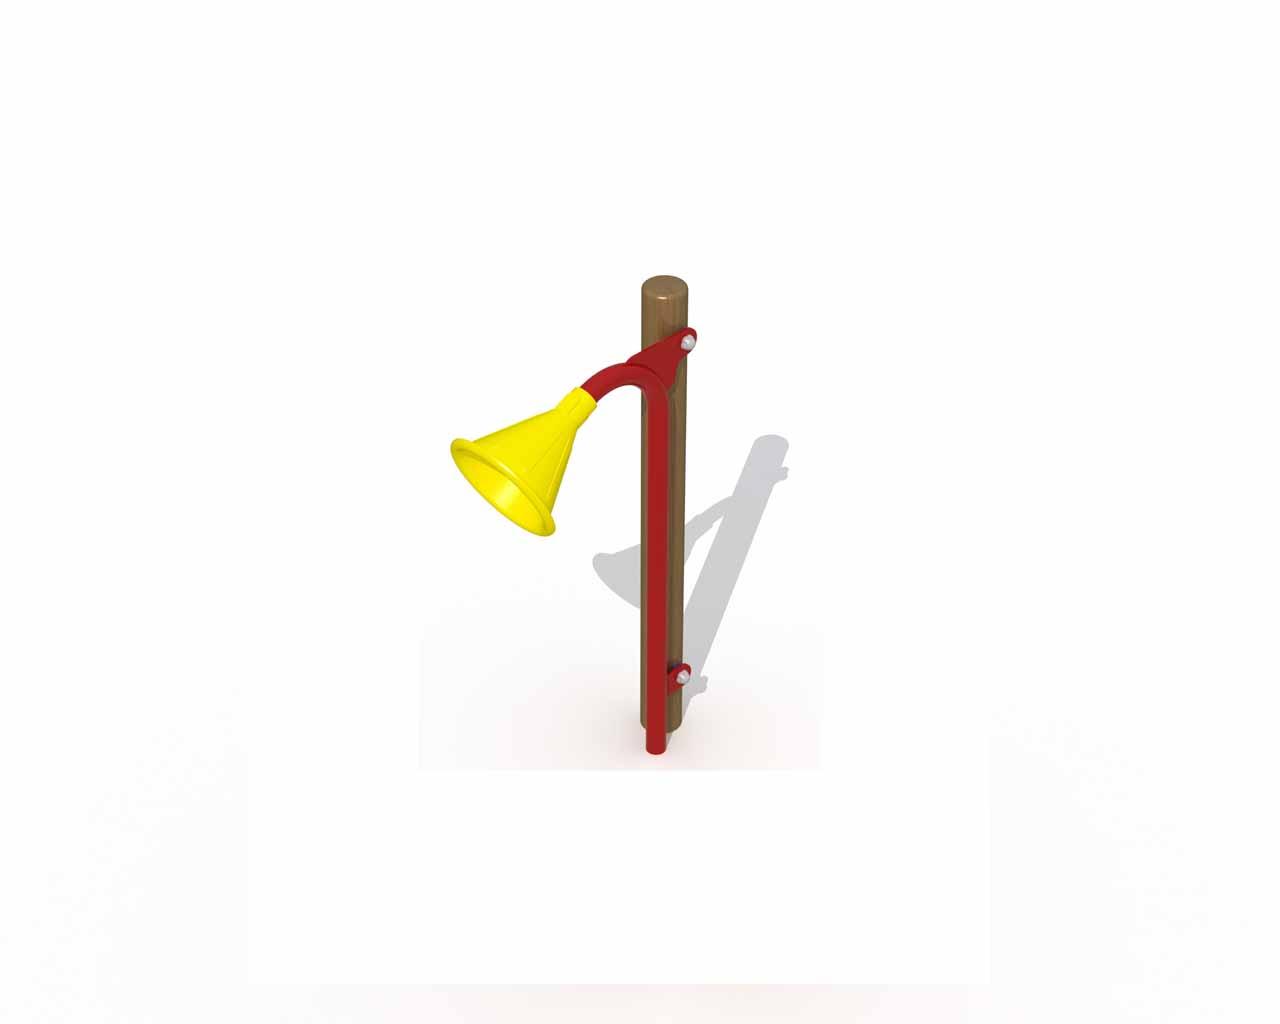 Megaphone For Wooden Posts (2 Pieces)